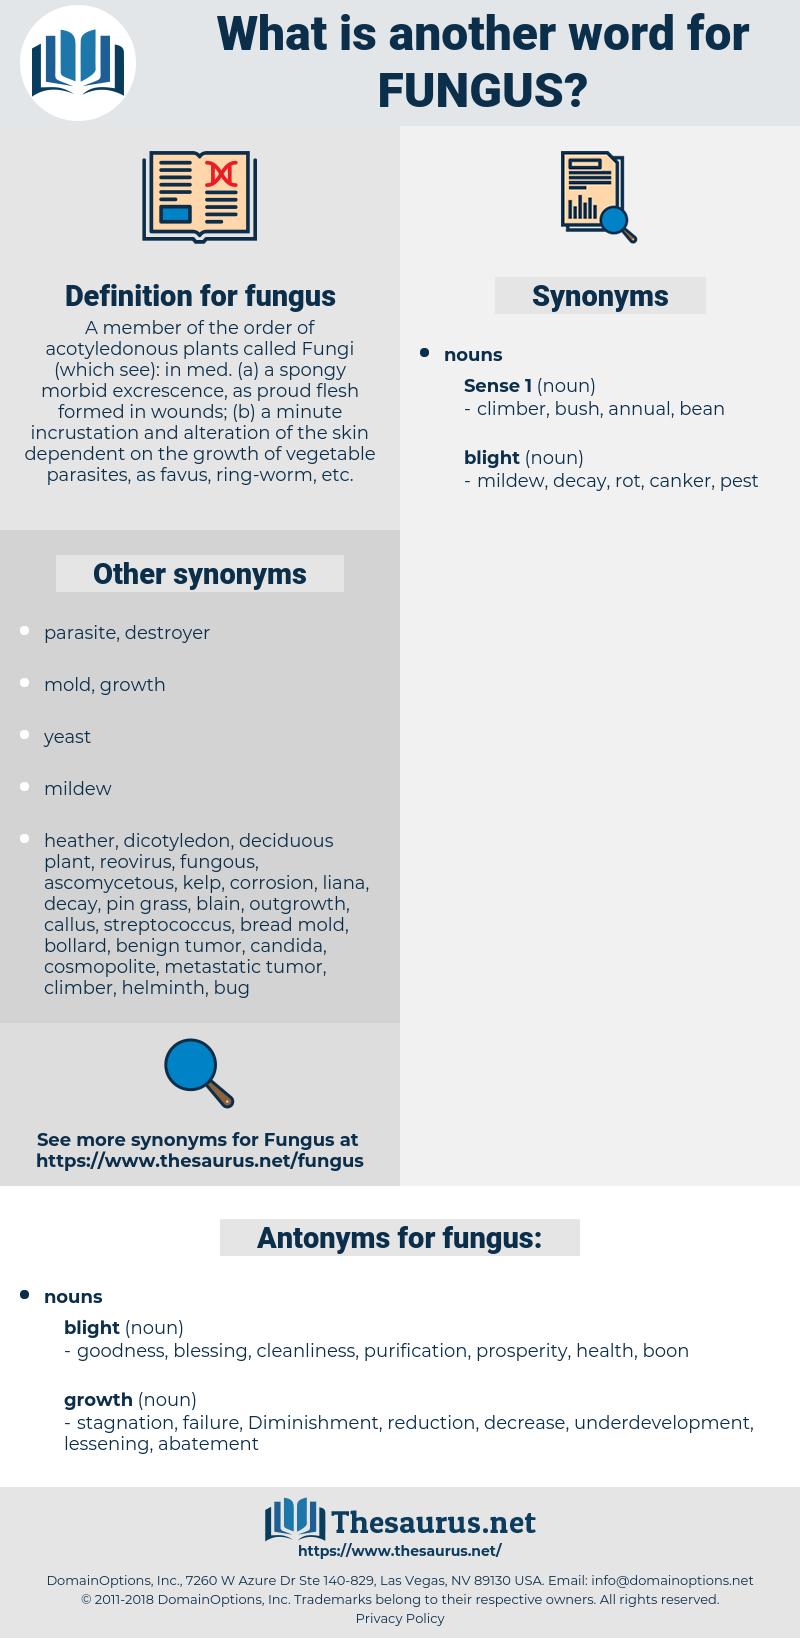 fungus, synonym fungus, another word for fungus, words like fungus, thesaurus fungus